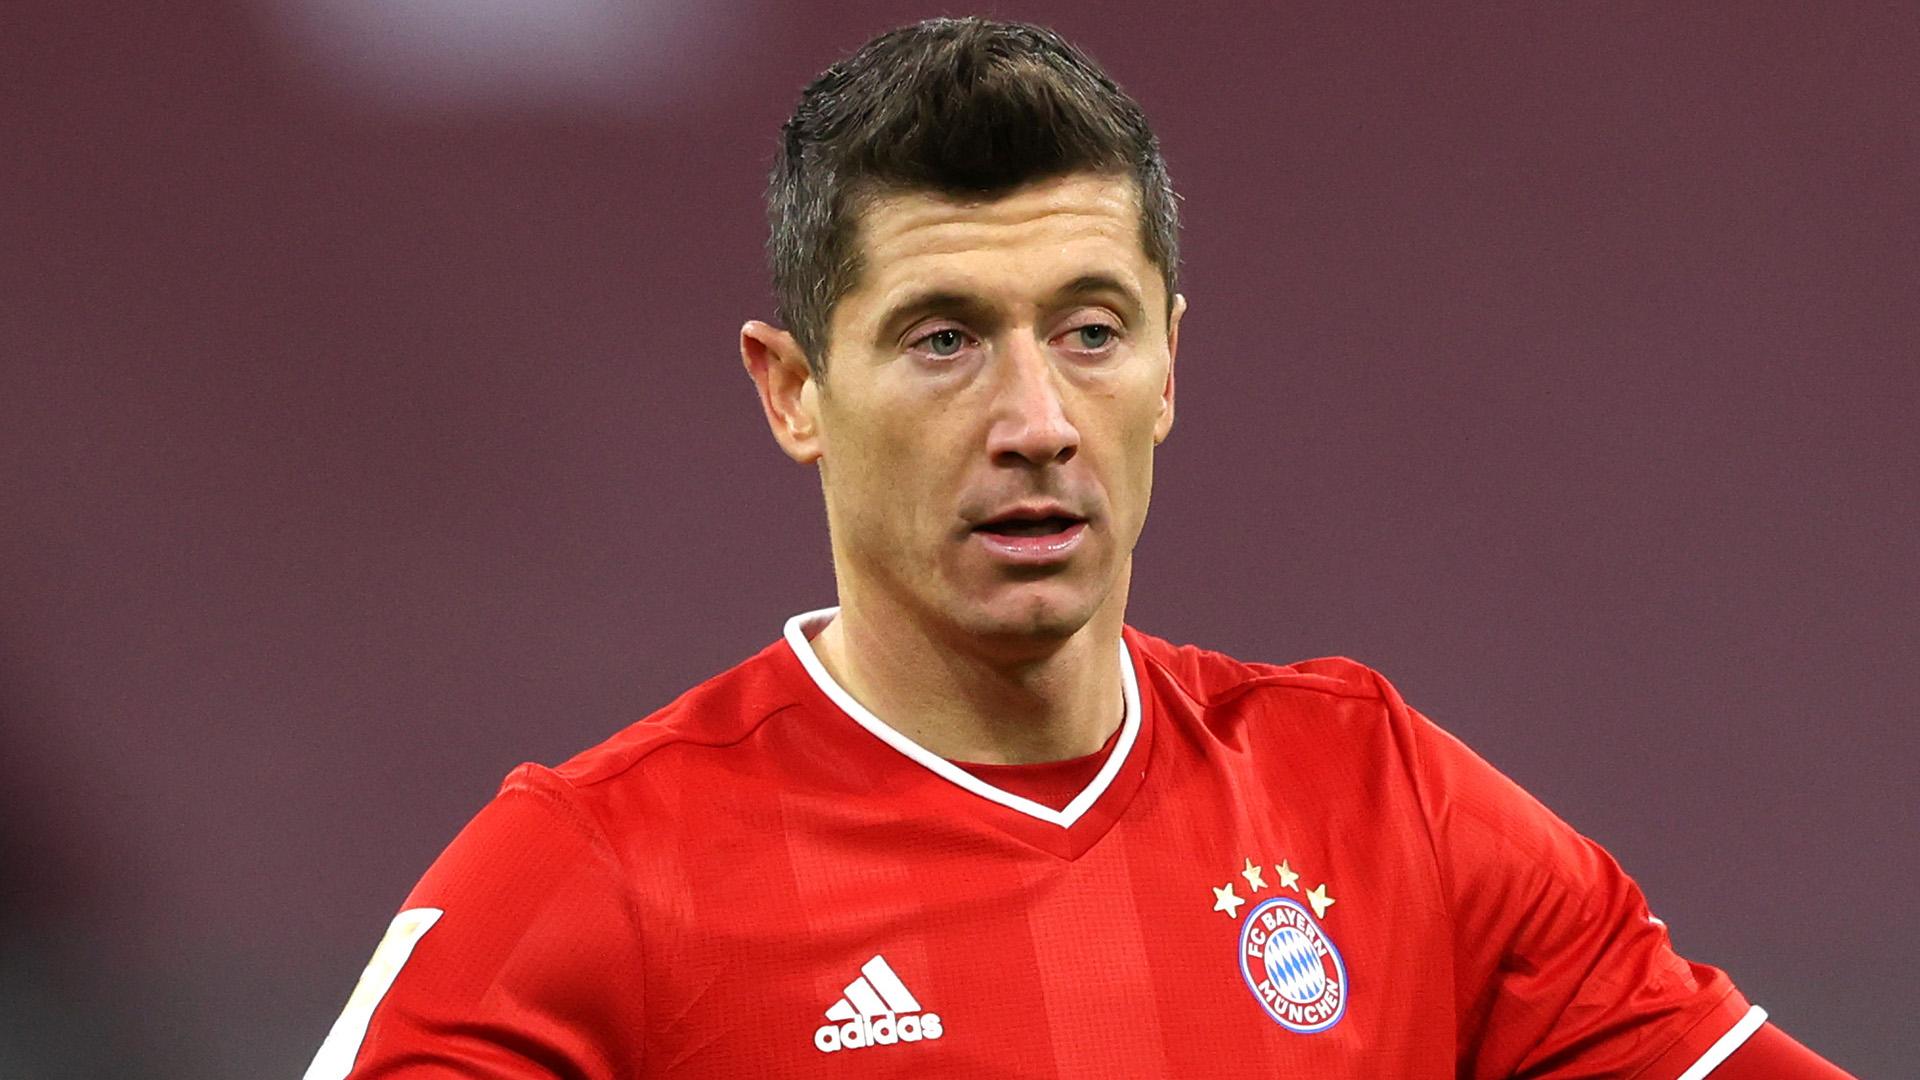 Lewandowski to miss second leg of Bayern Munich's Champions League  quarter-final against PSG with knee injury | Goal.com